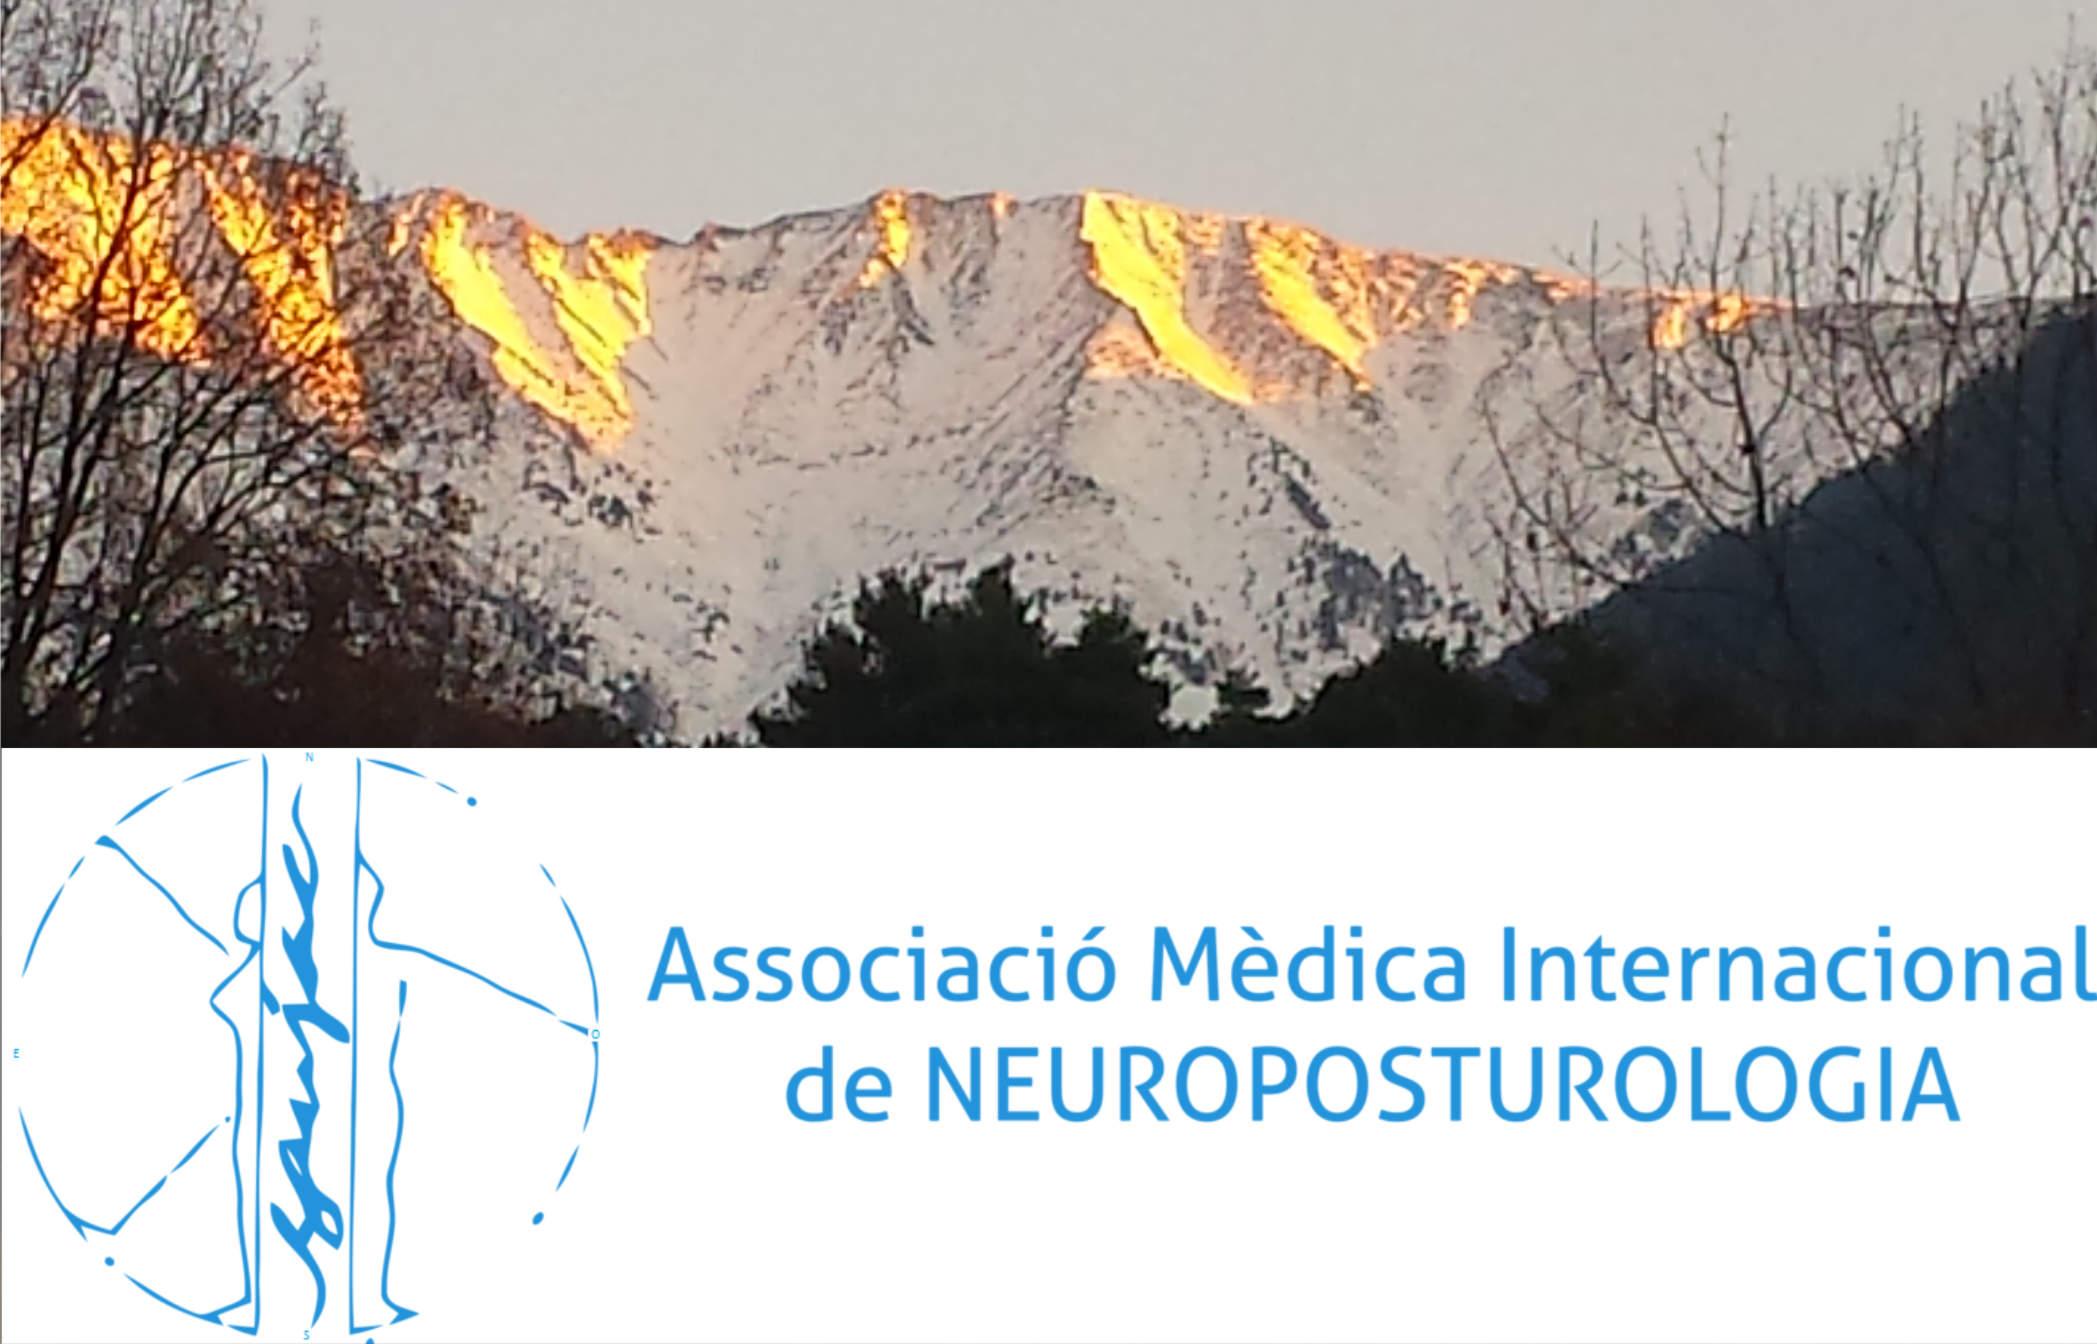 Associacion Medica Internacional de Neuroposturologia